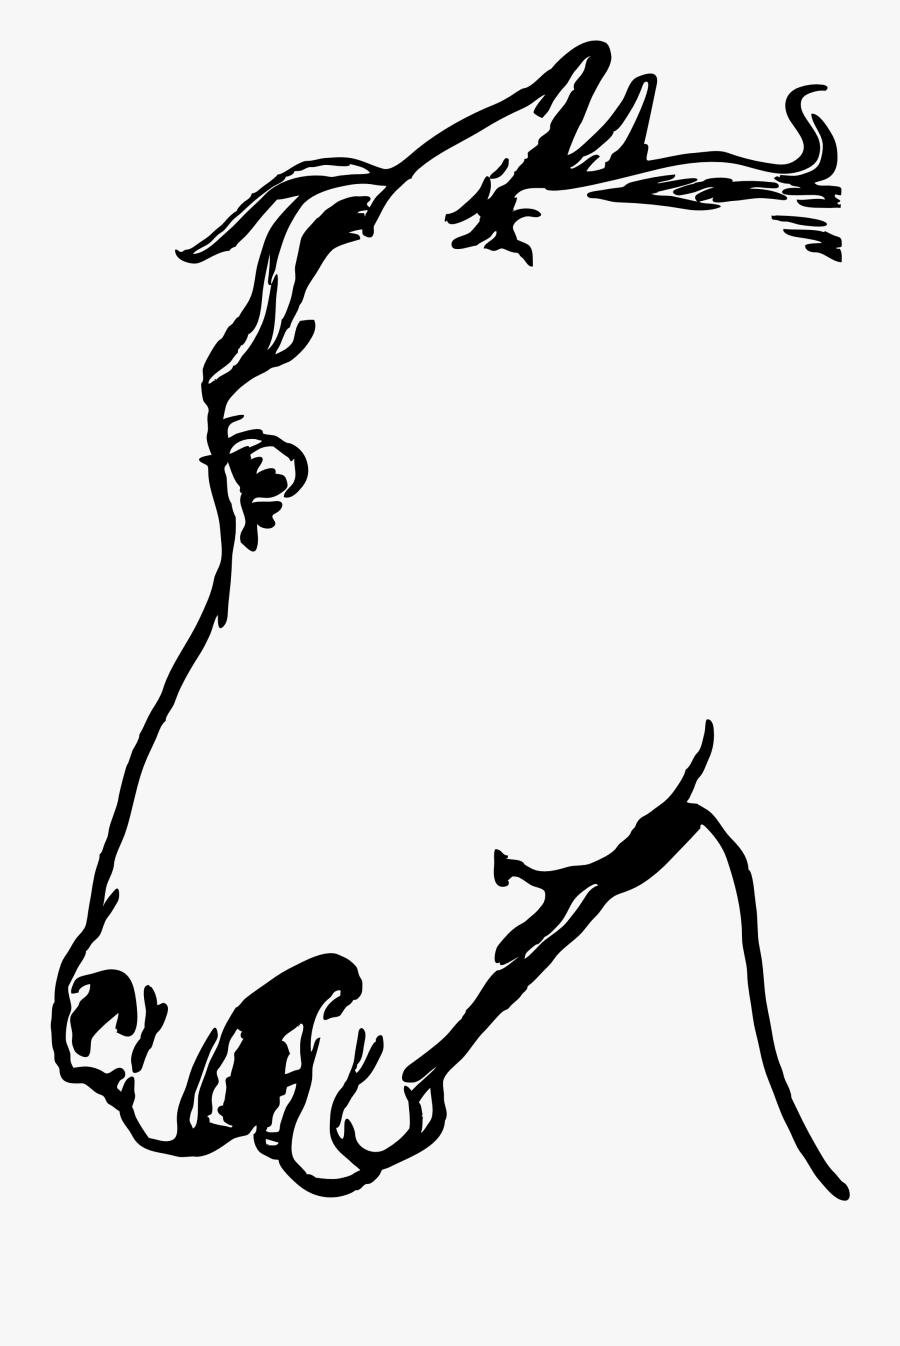 Horsehead Gambar Sketsa Kepala Kuda Free Transparent